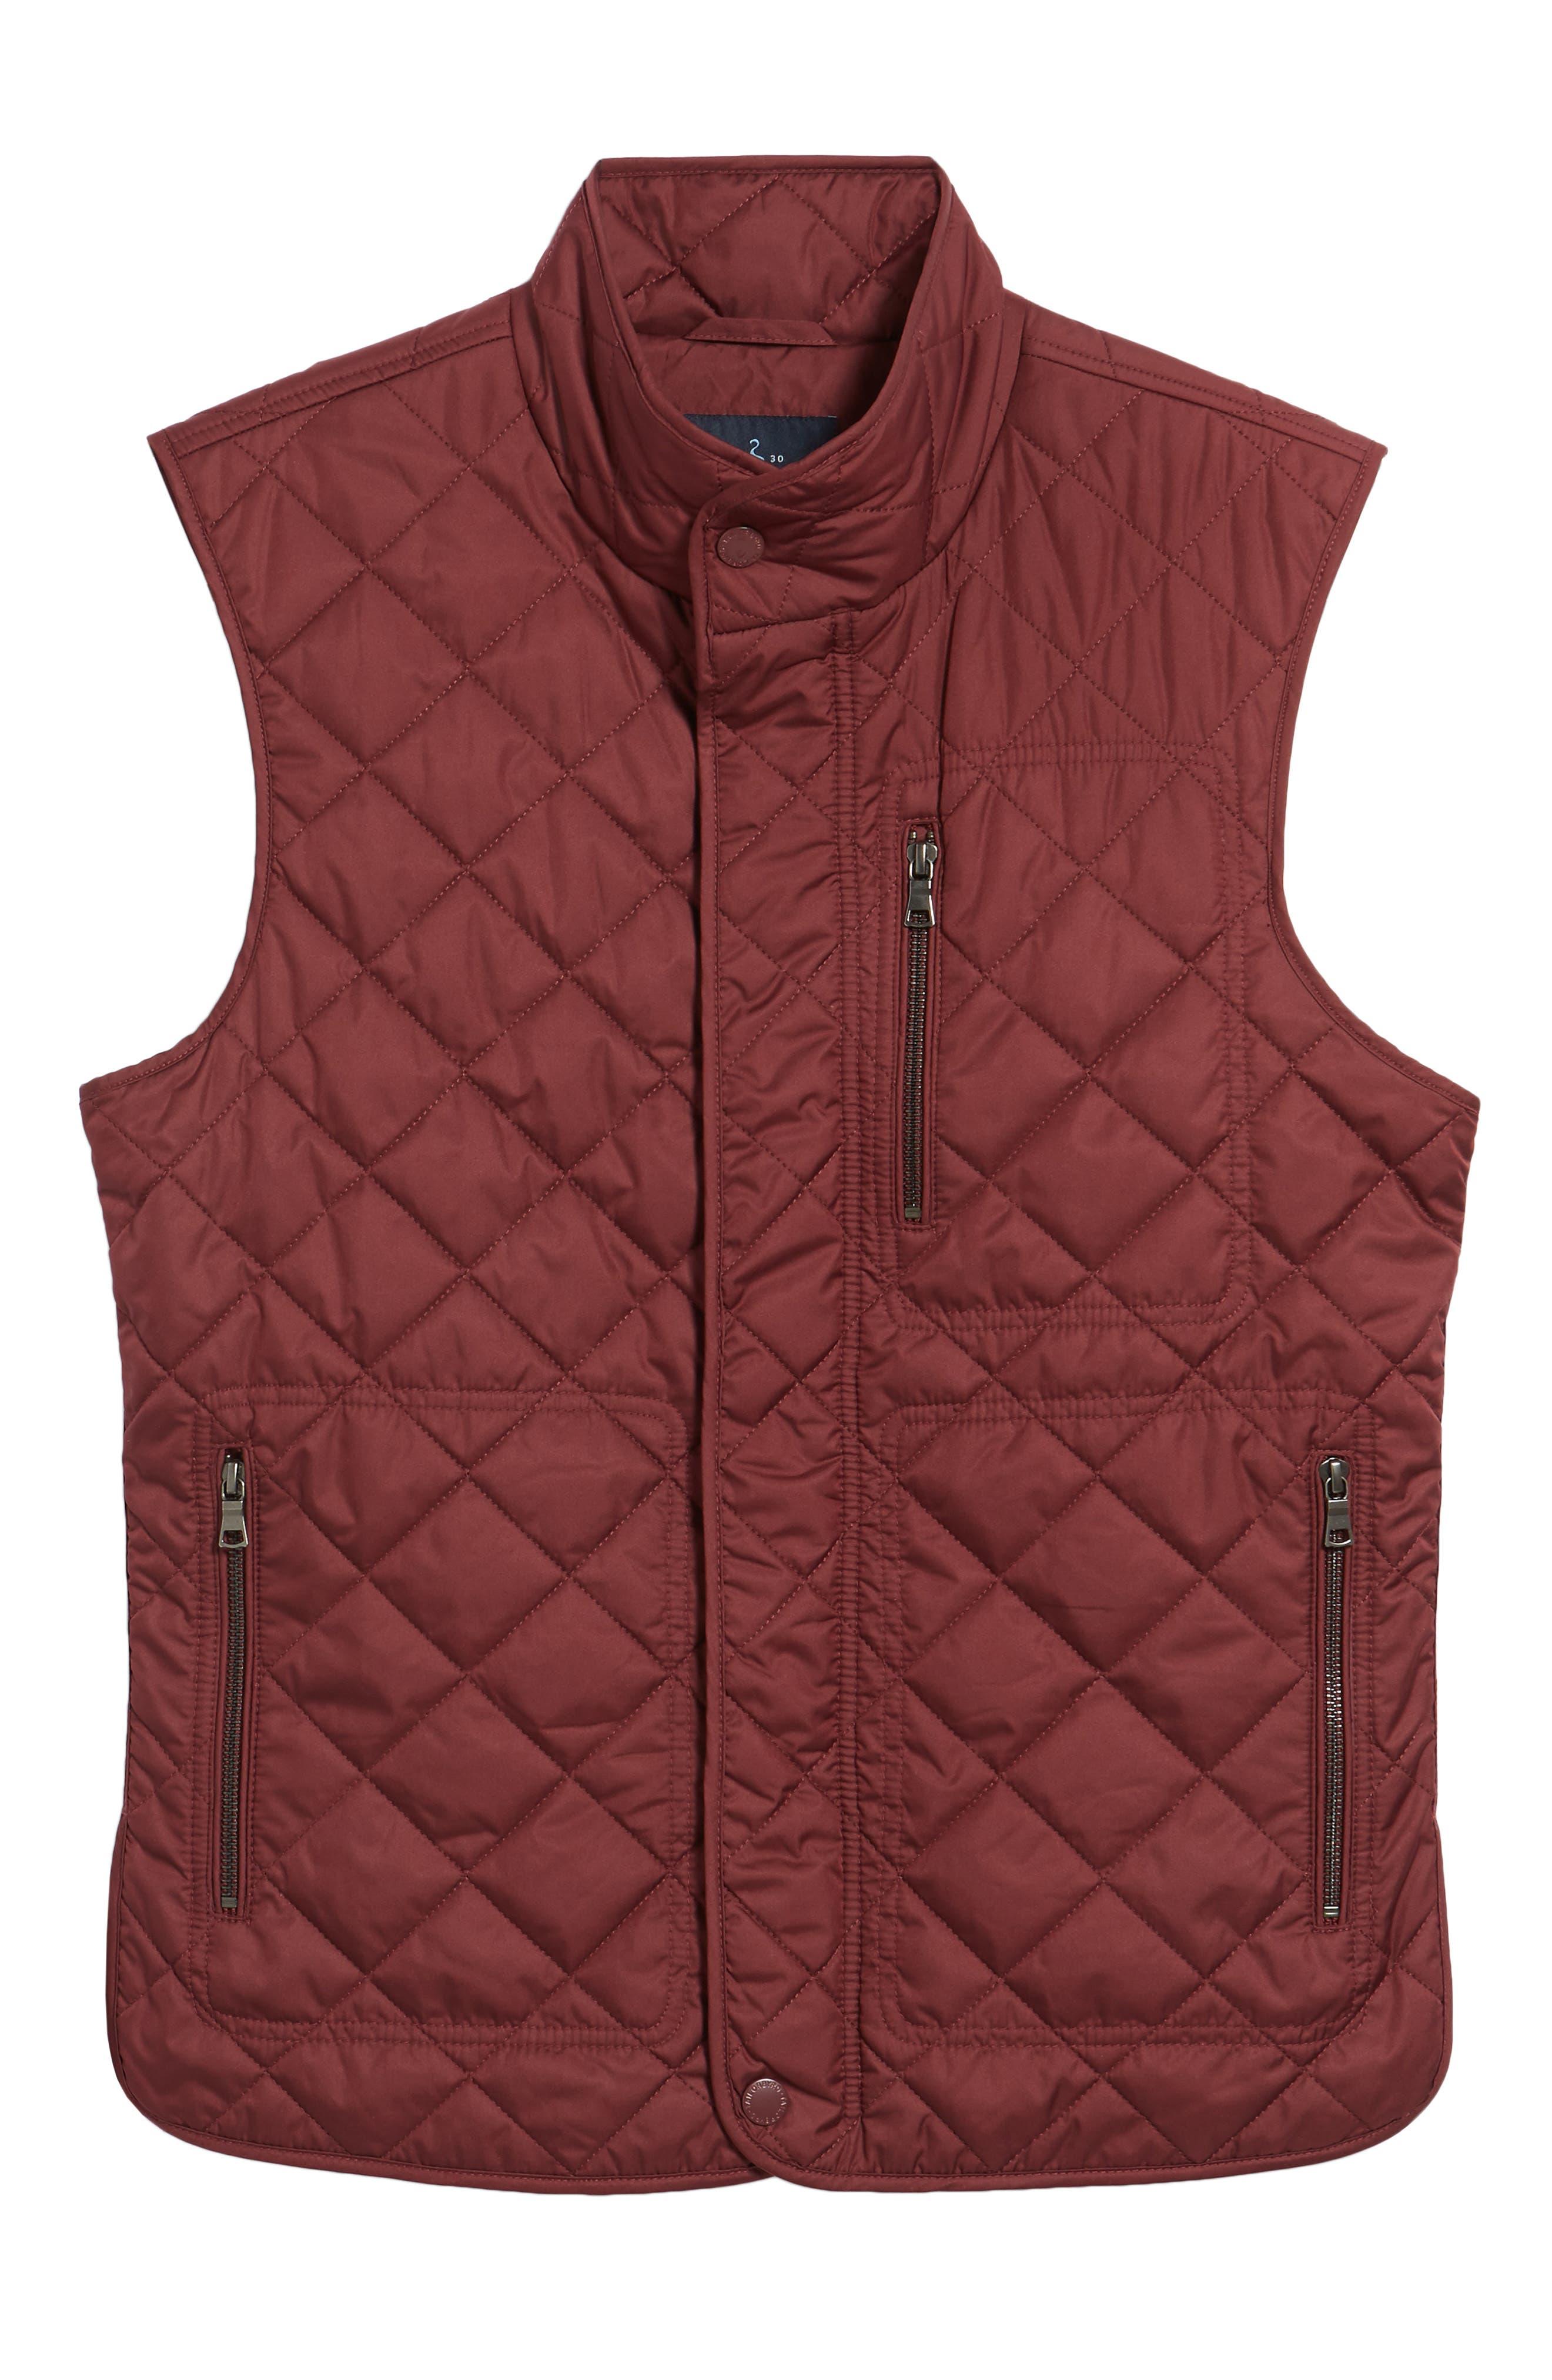 Hessmer Quilted Vest,                             Alternate thumbnail 5, color,